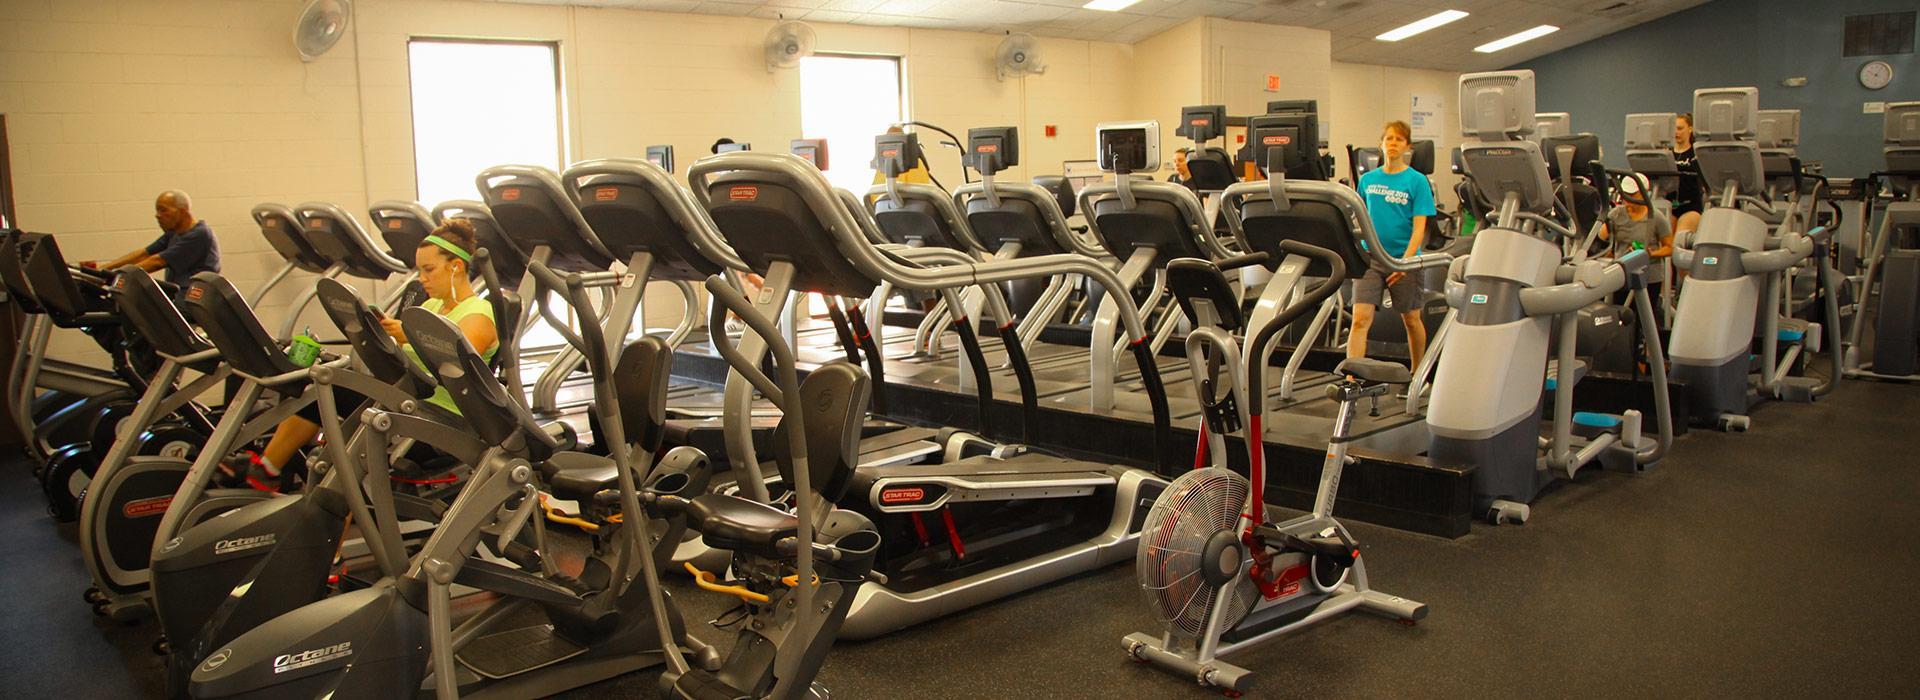 Greenbrier Family YMCA | YMCA of South Hampton Roads